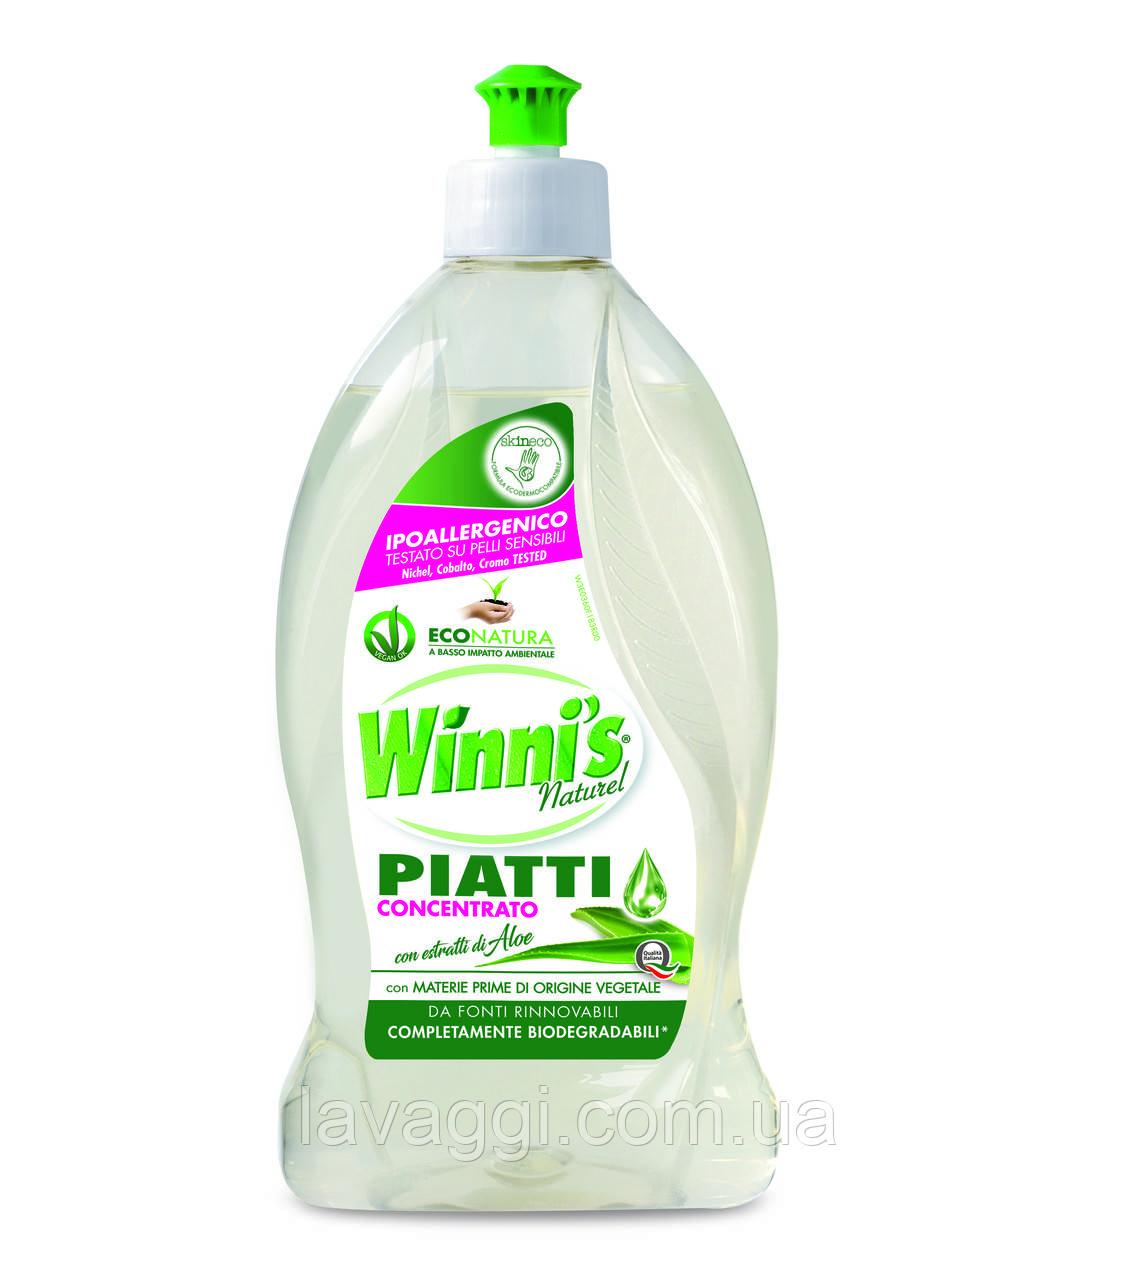 Гипоалергенное средство для мытья посуды Madel Winni's Piatti Concentrato di Aloe 500ml